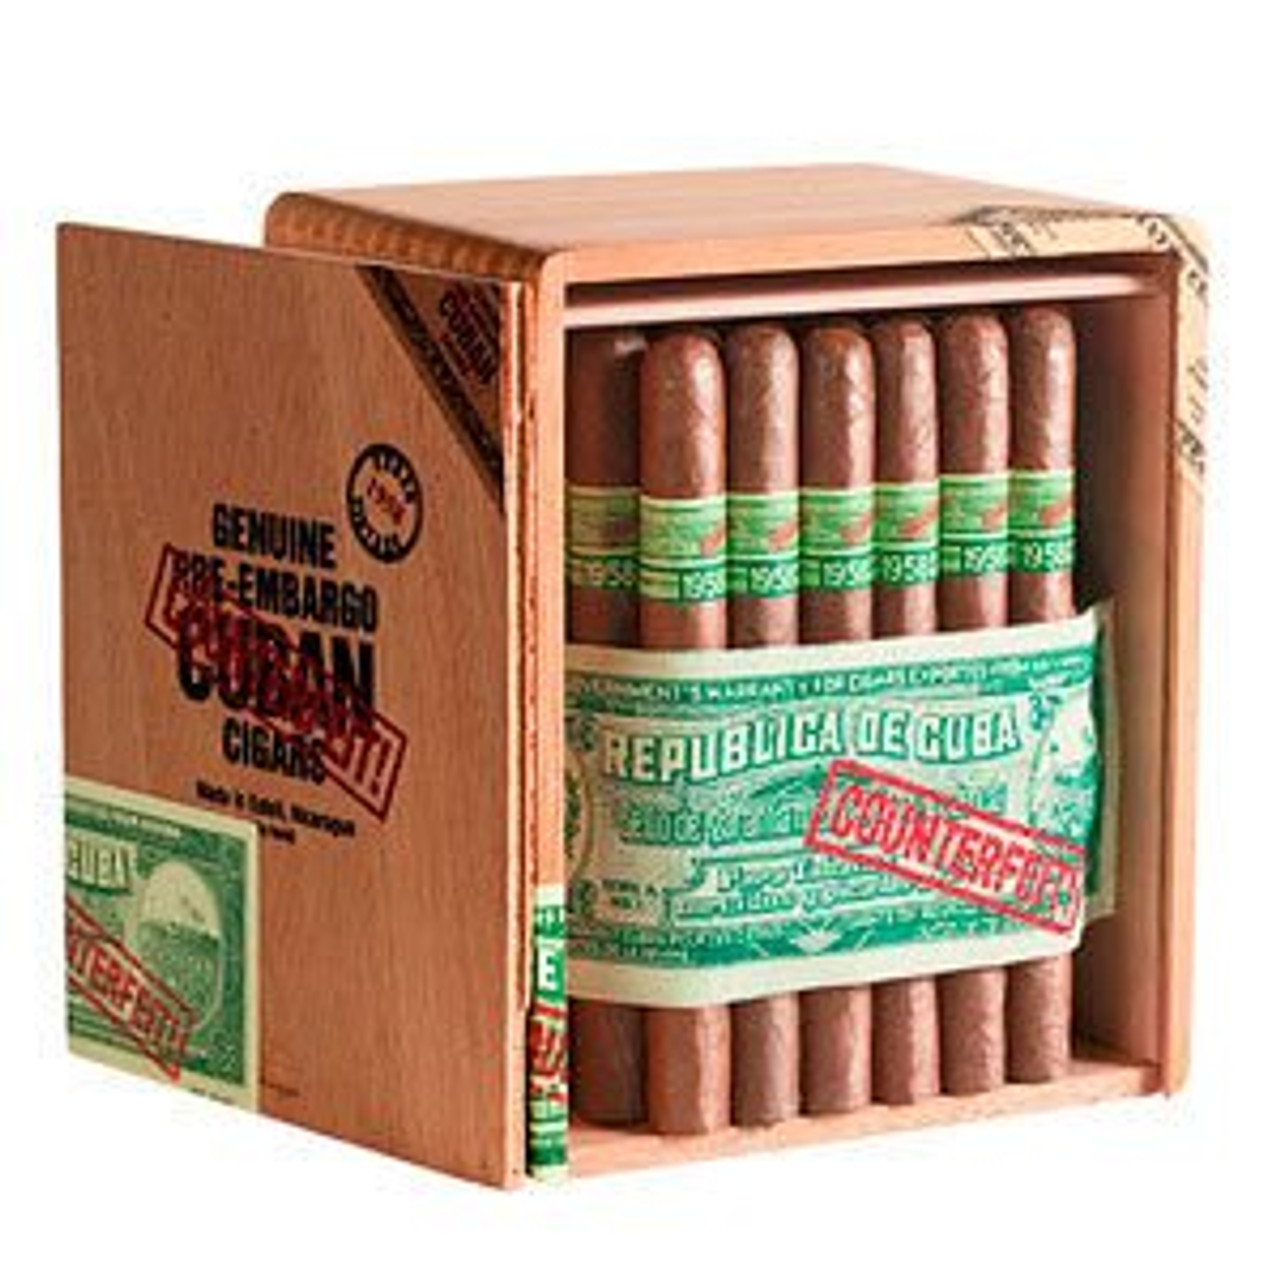 Genuine Pre-Embargo Counterfeit Cubans 1958 Belicoso Figurado Cigars - 6 x 54 (Box of 25)